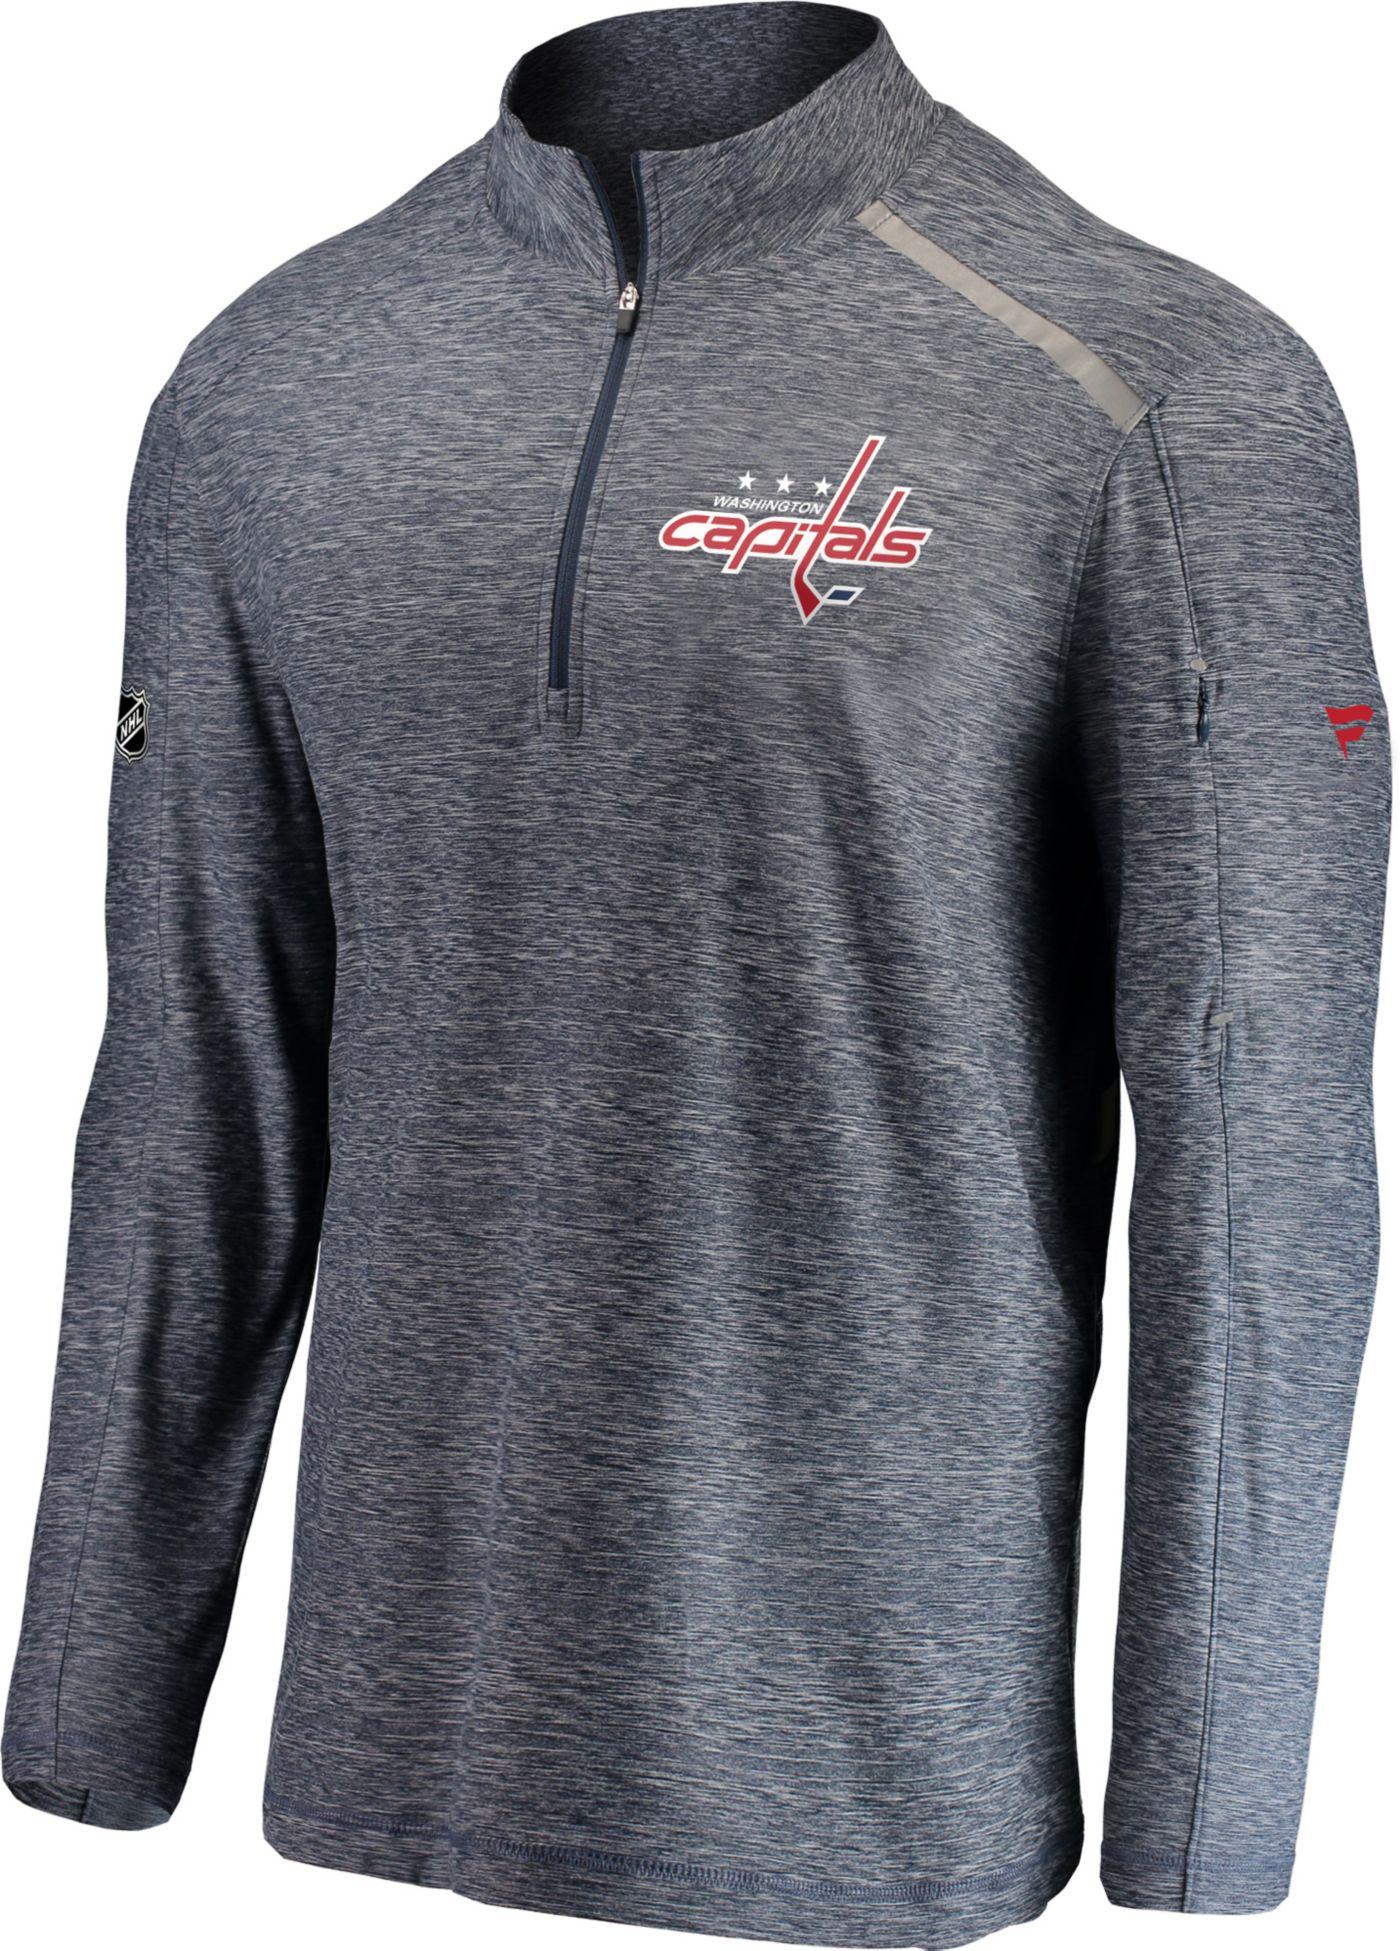 NHL Men's Washington Capitals Authentic Pro Clutch Navy Heathered Quarter-Zip Pullover